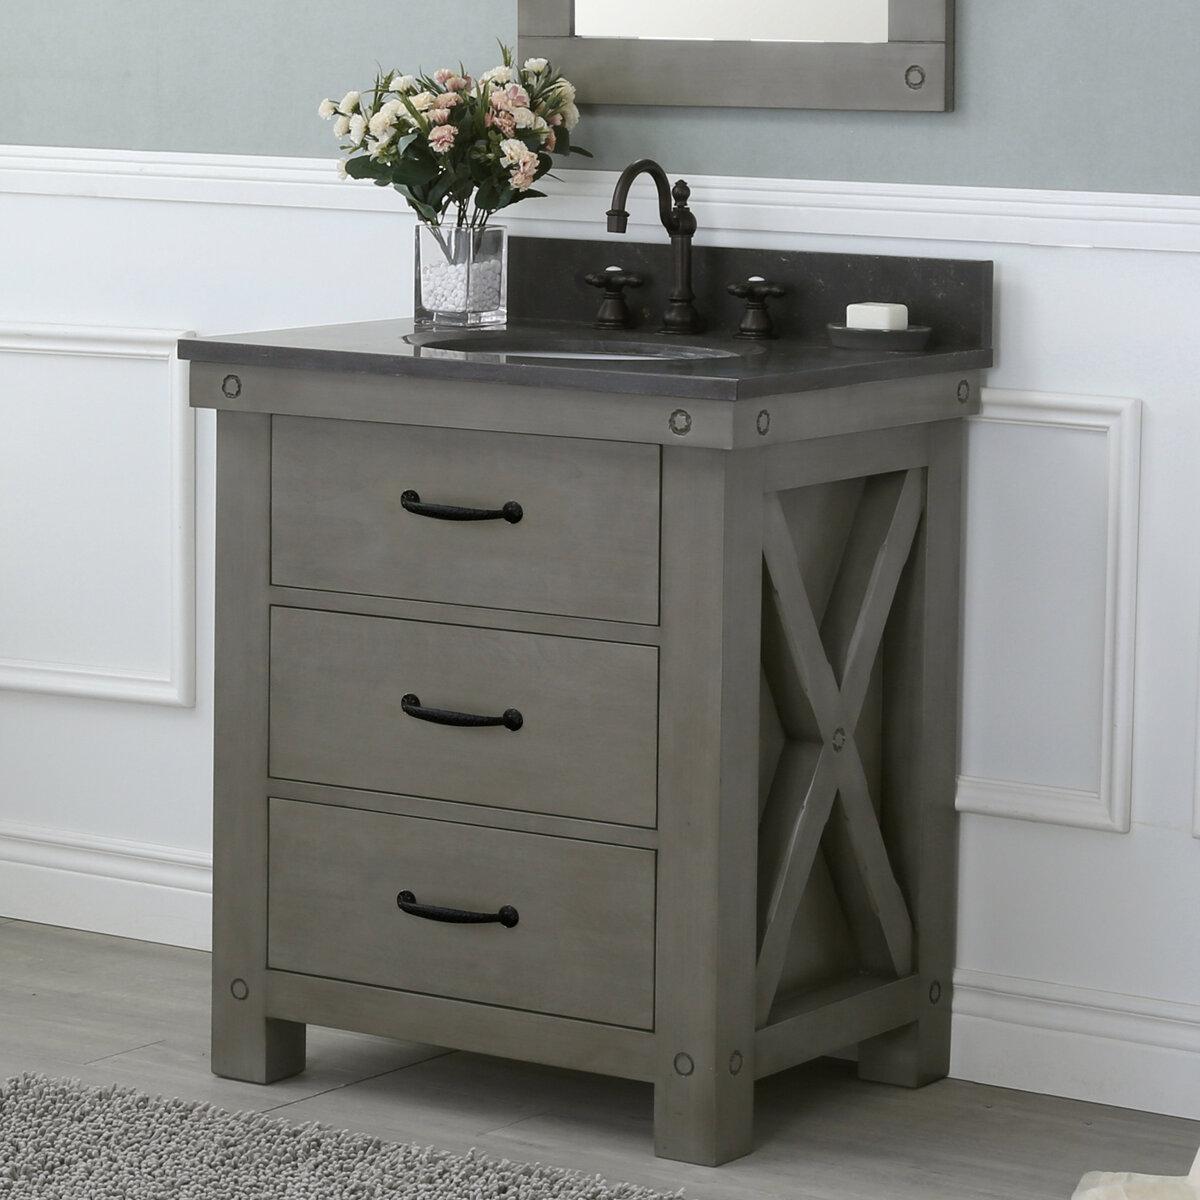 Tremendous Jessen 30 Single Bathroom Vanity Set Download Free Architecture Designs Rallybritishbridgeorg